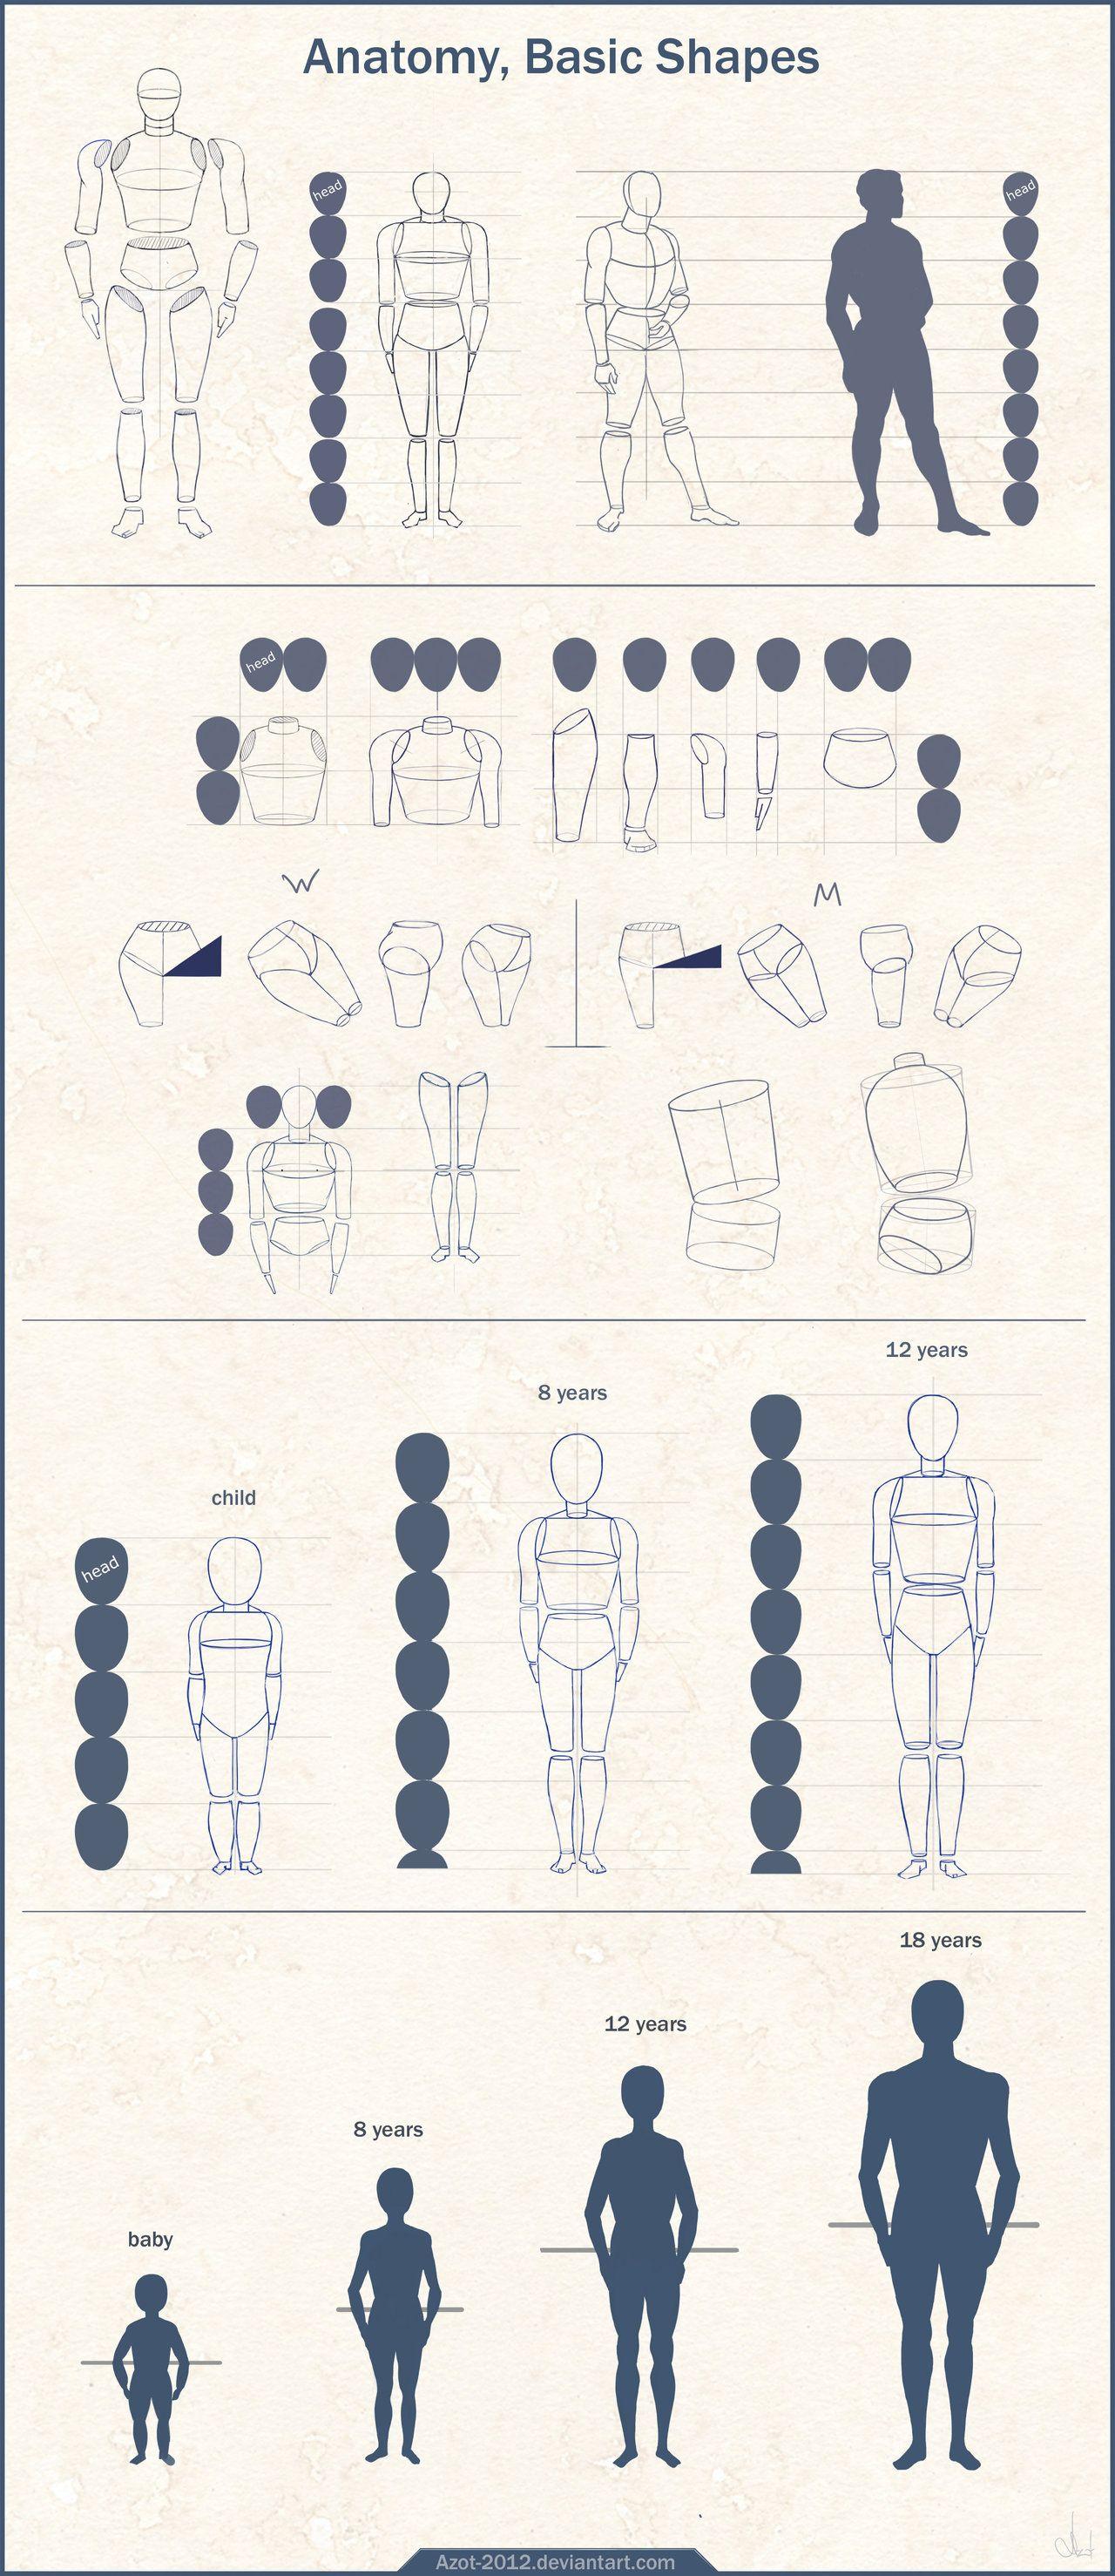 Anatomy Basic Shapes by Azot2014.deviantart.com on @deviantART   ART ...